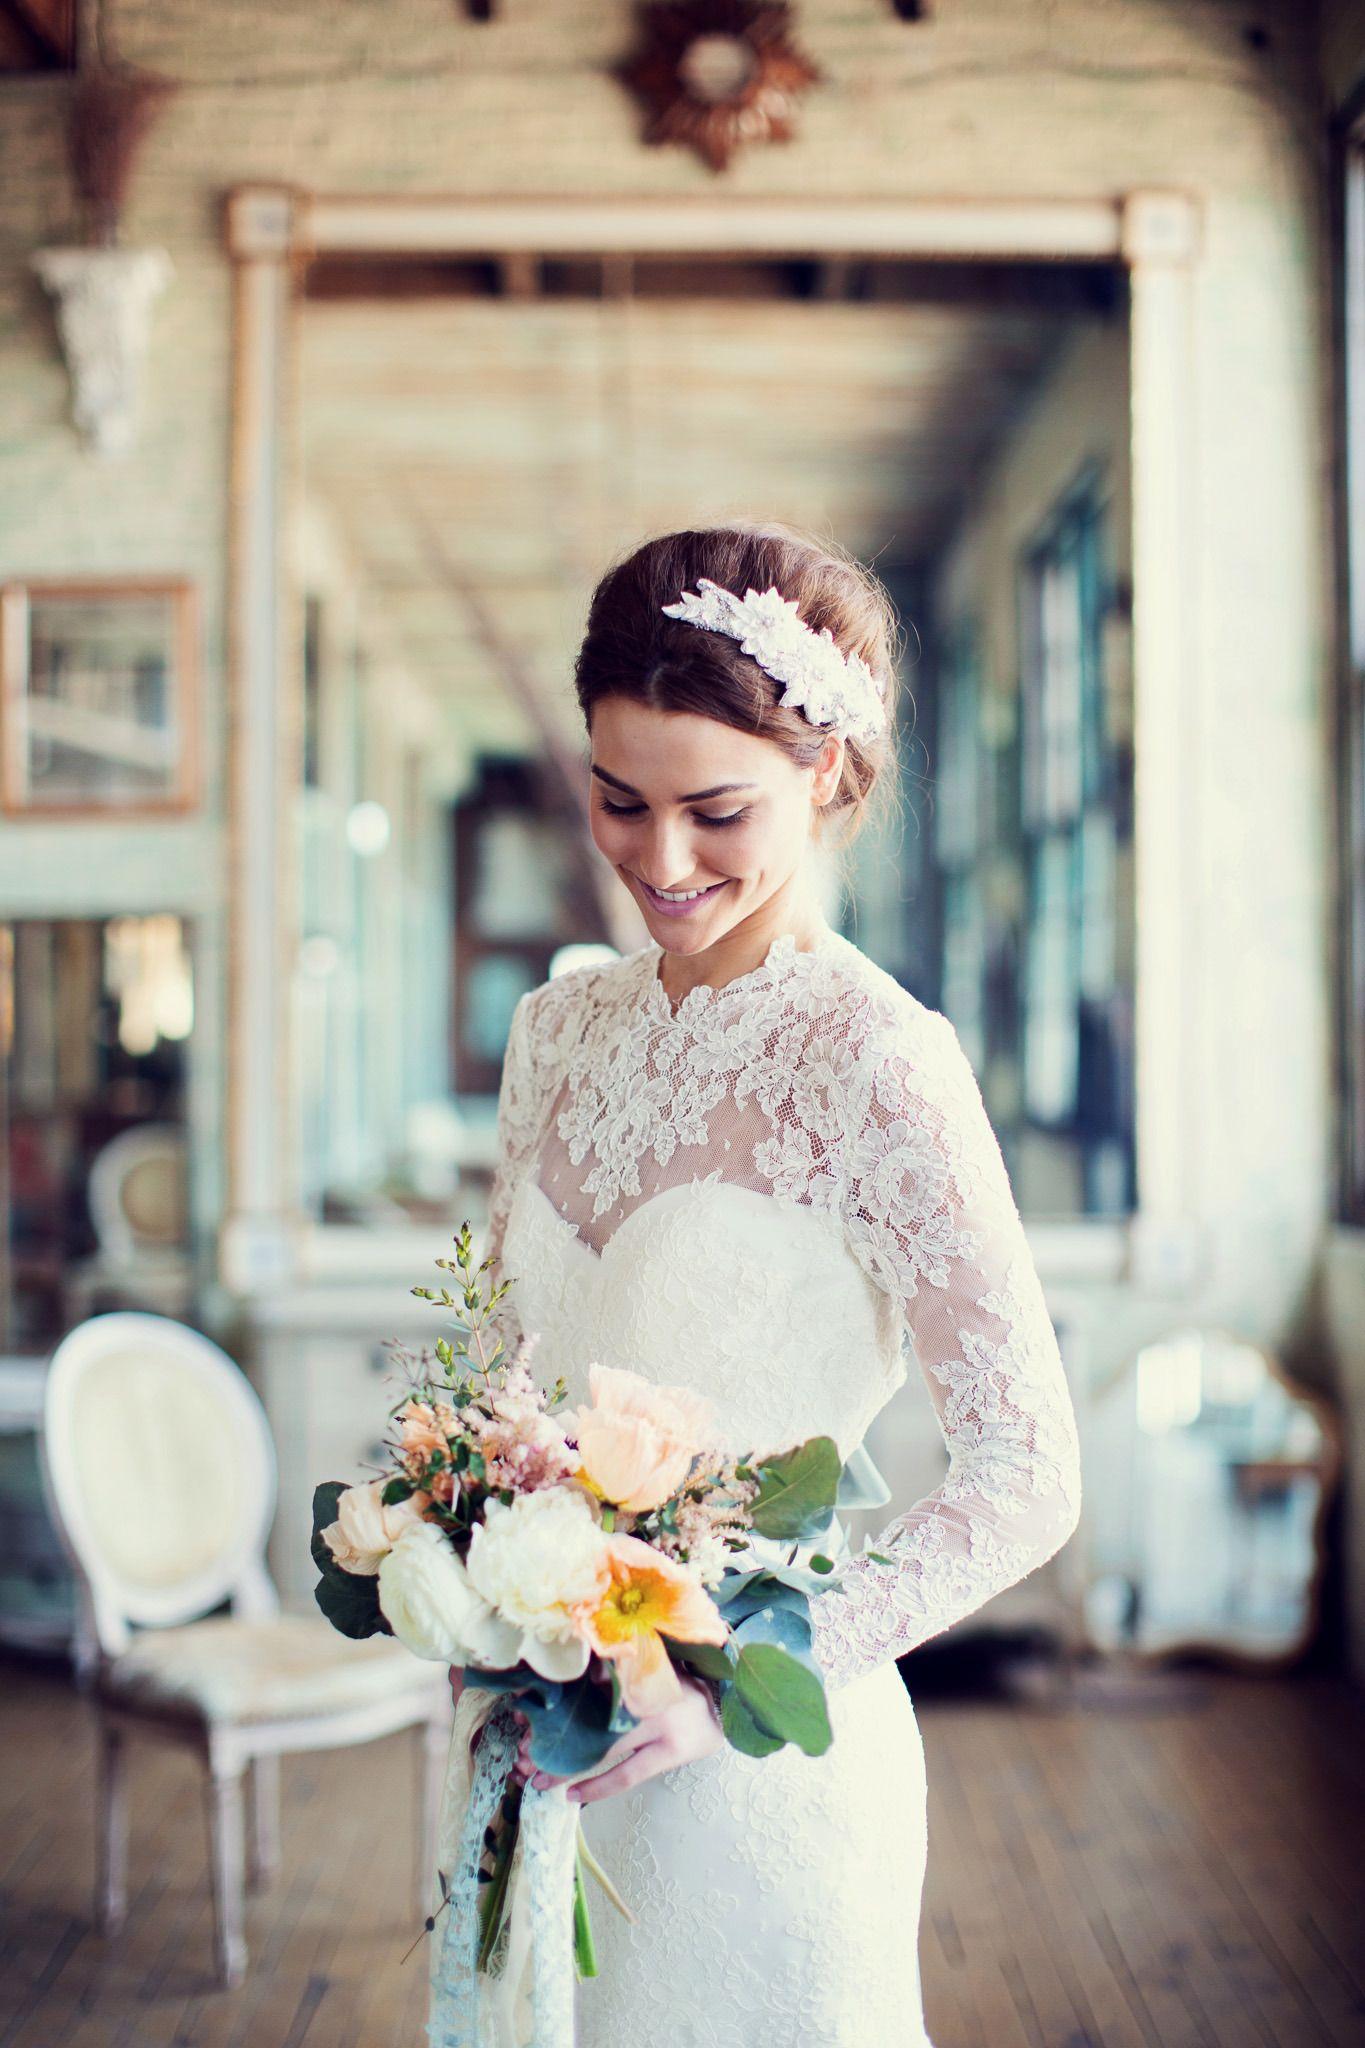 Photography: Peaches And Mint - www.peachesandmint.com  Read More: http://www.stylemepretty.com/2014/05/12/emerald-mint-peach-wedding-inspiration/